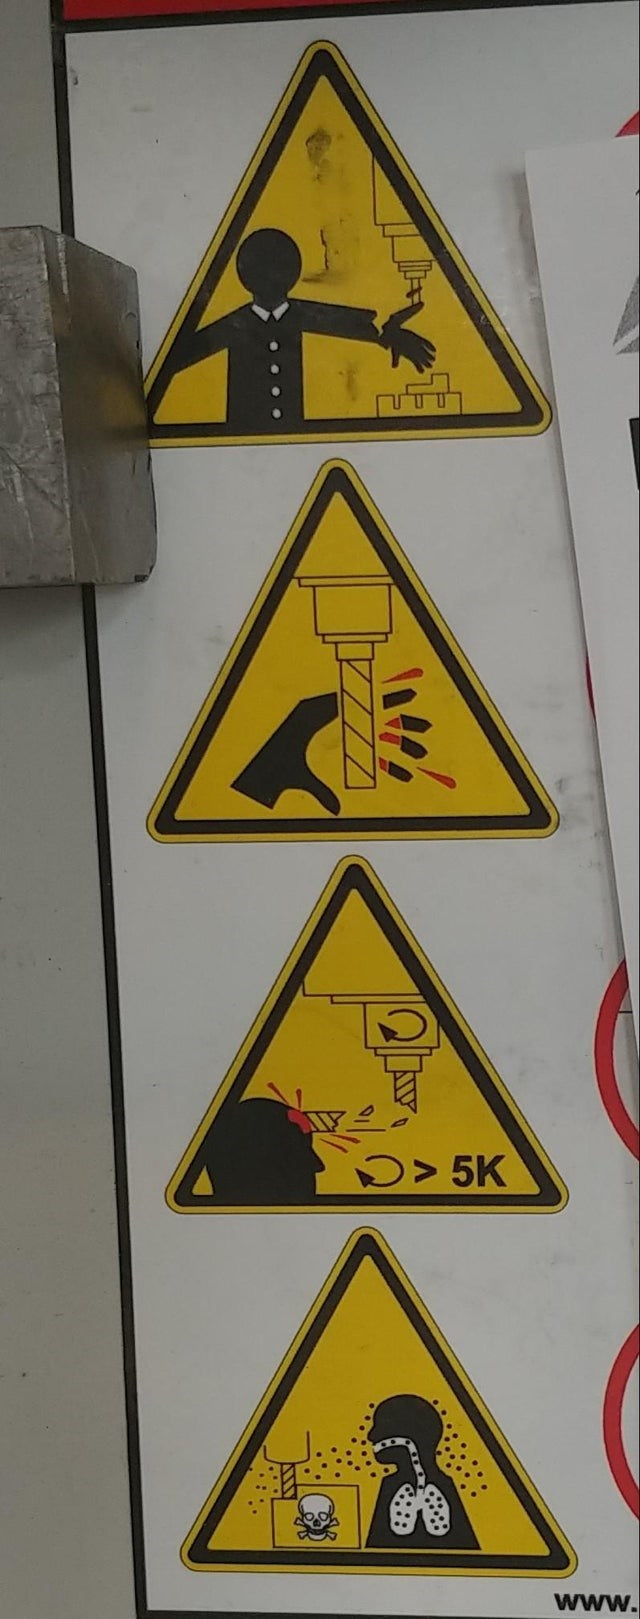 Traffic sign - D> 5K www.